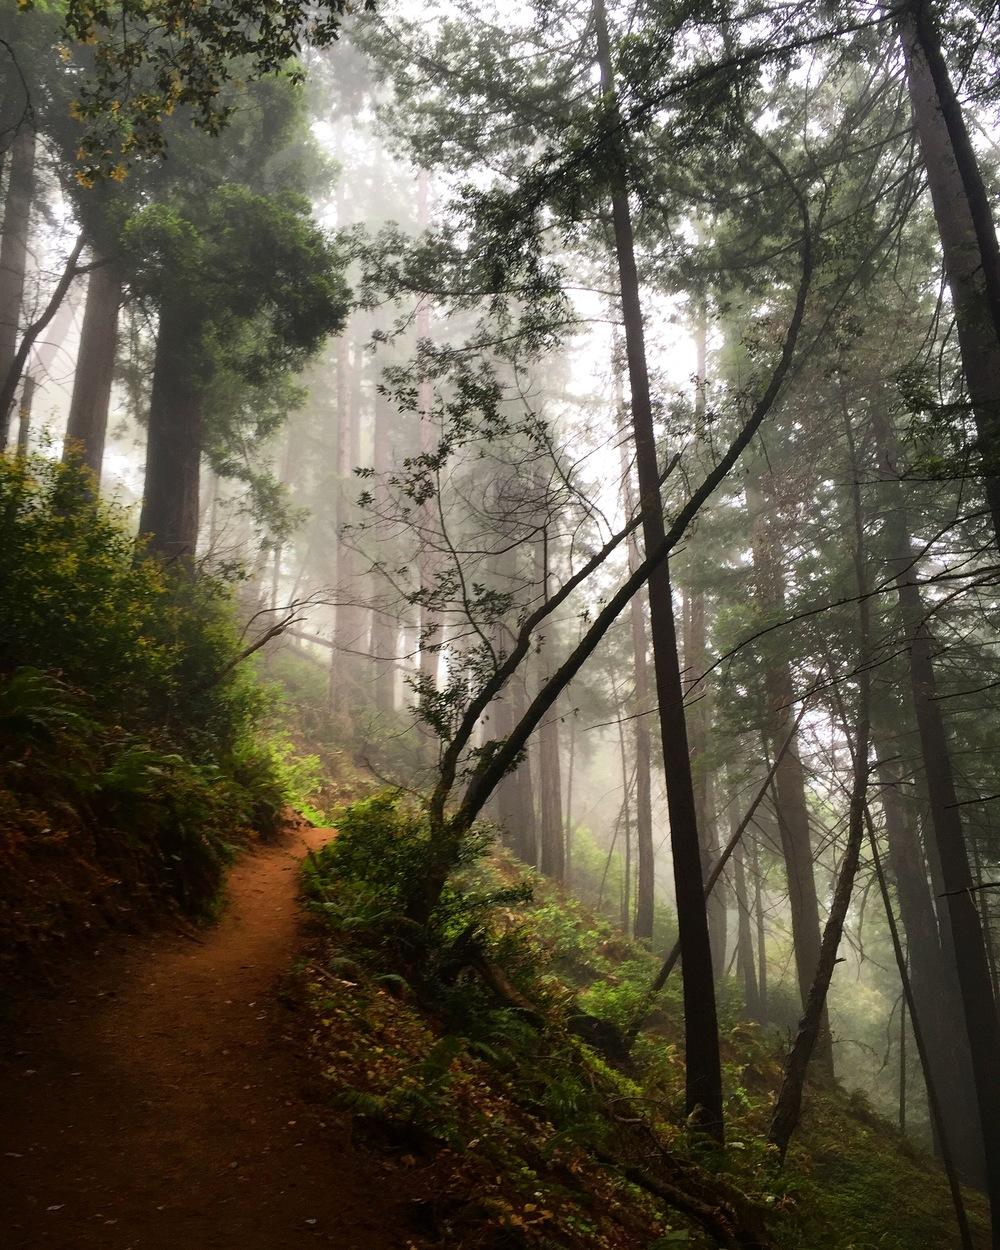 Ewoldsen Trail, Julia Pfeiffer Burns State Park